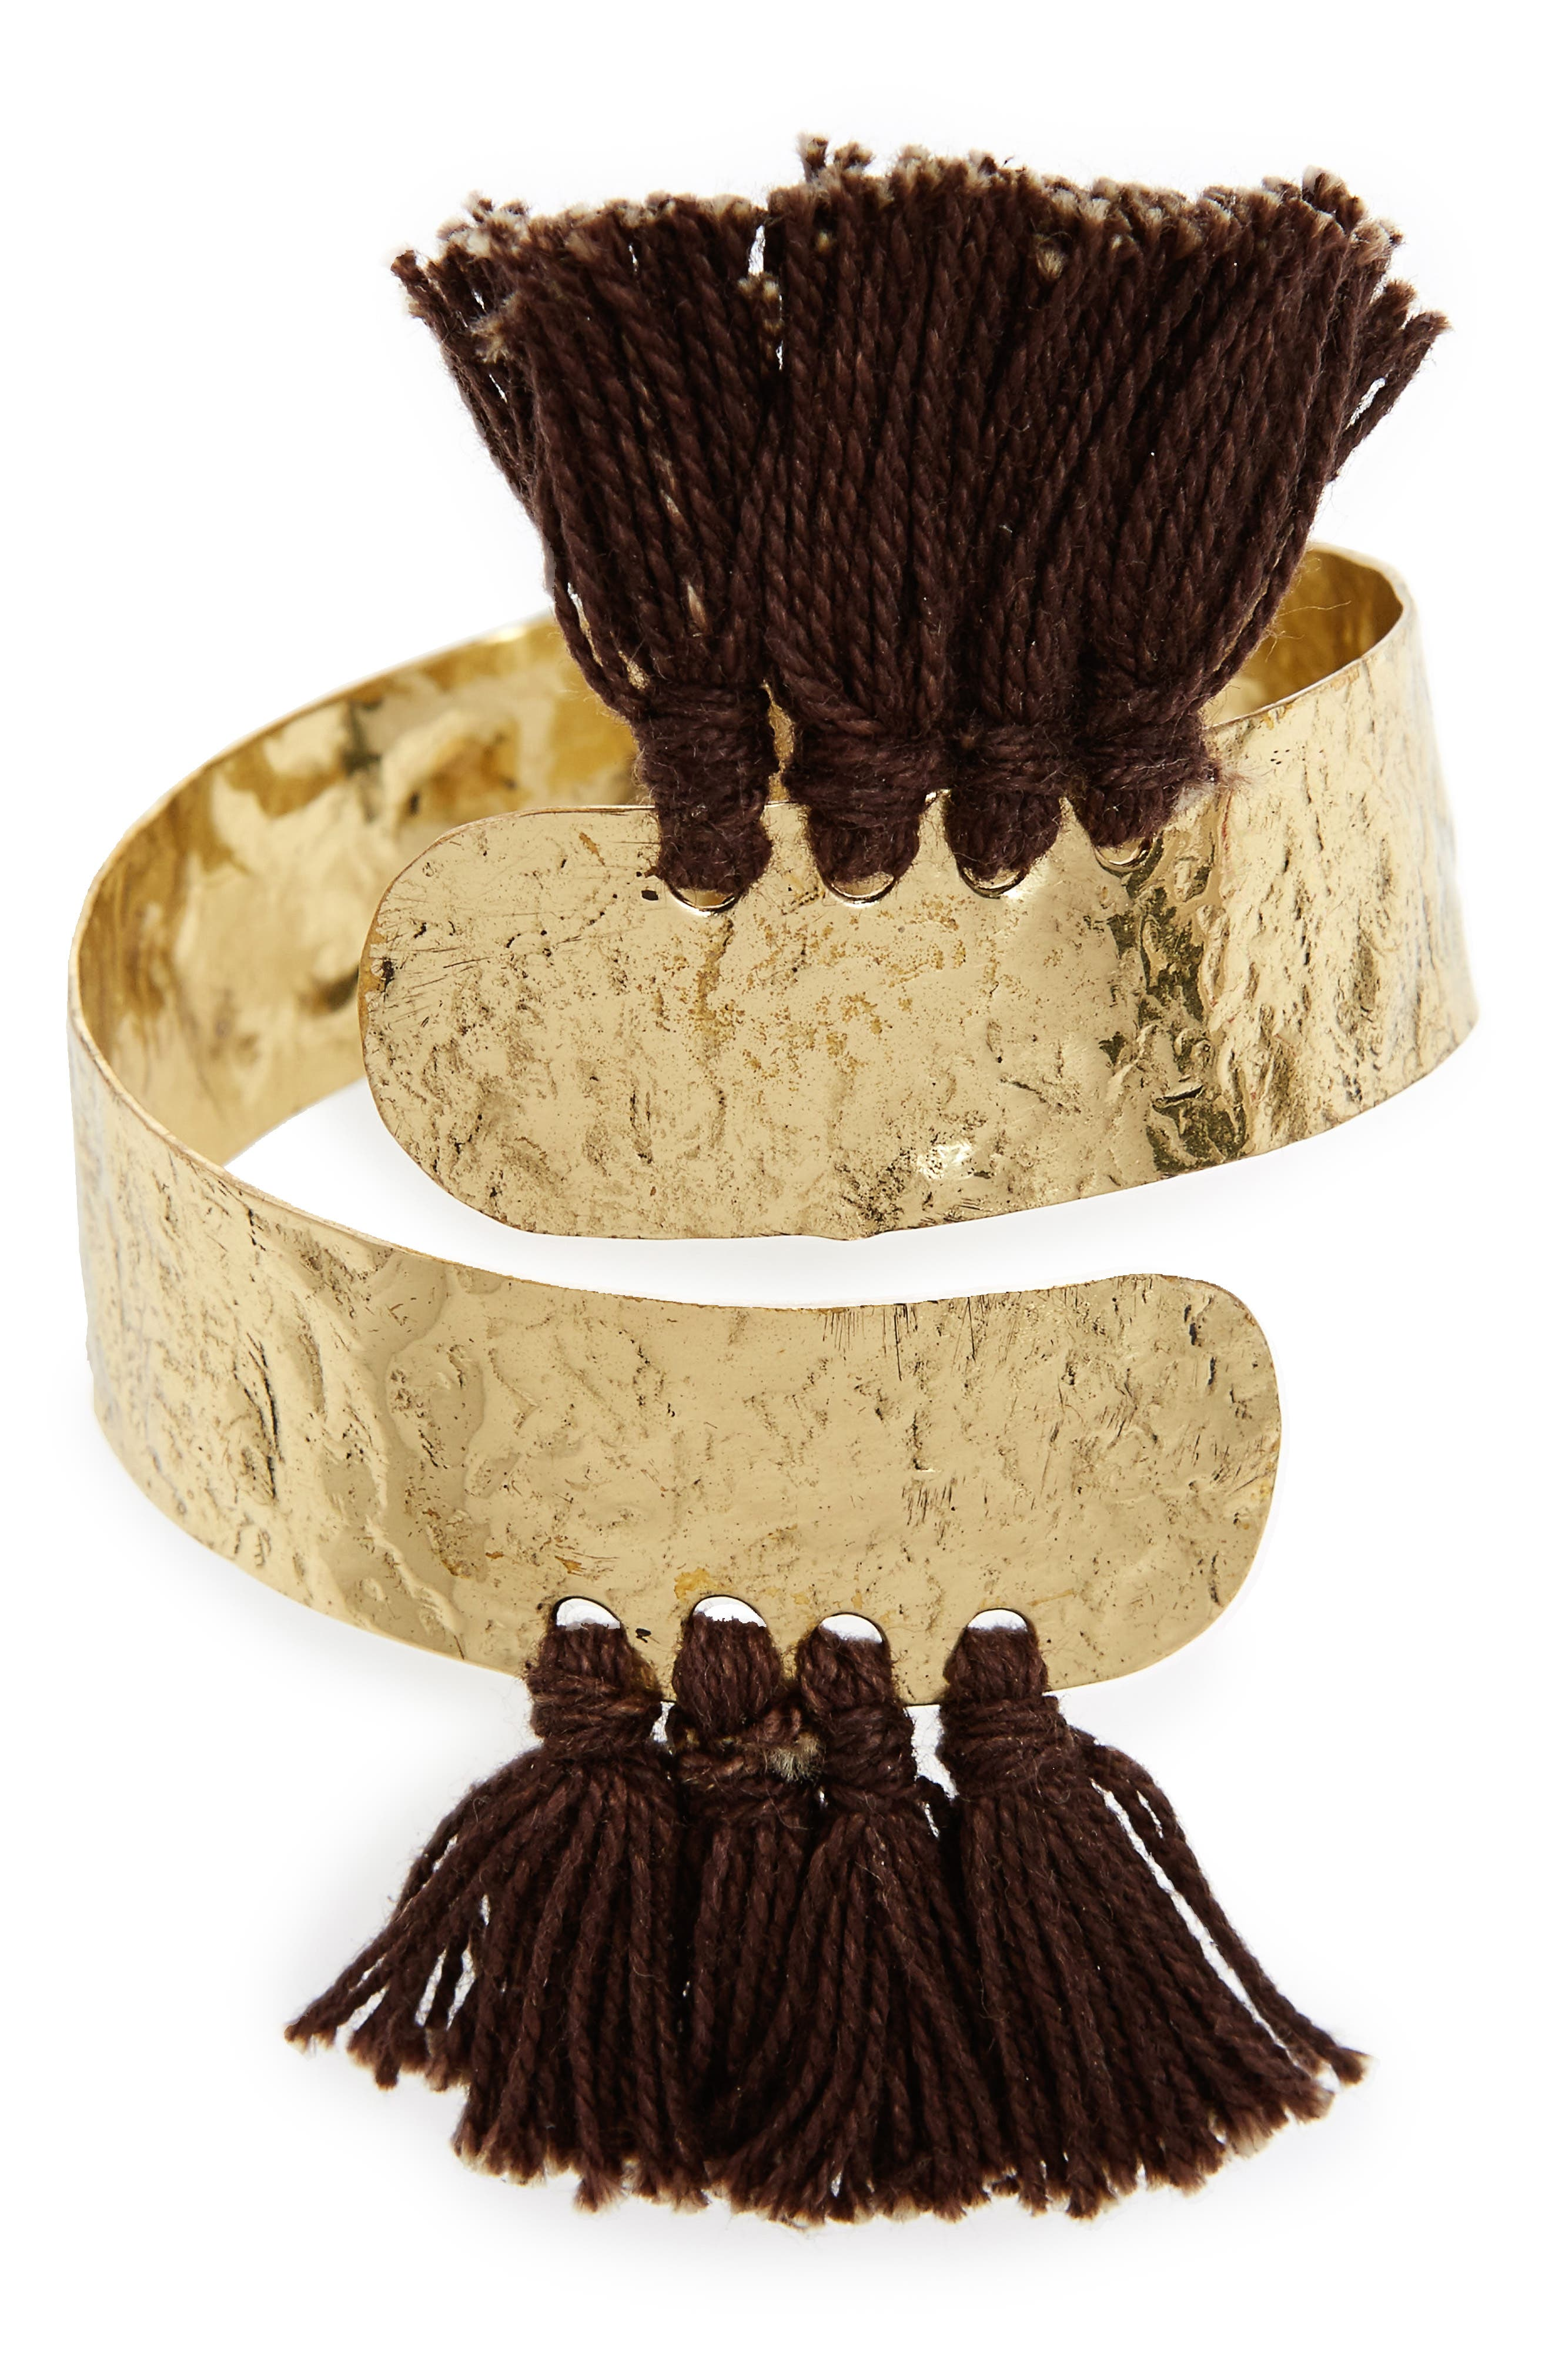 Aiu Hammered Tassel Cuff Bracelet,                             Main thumbnail 1, color,                             020